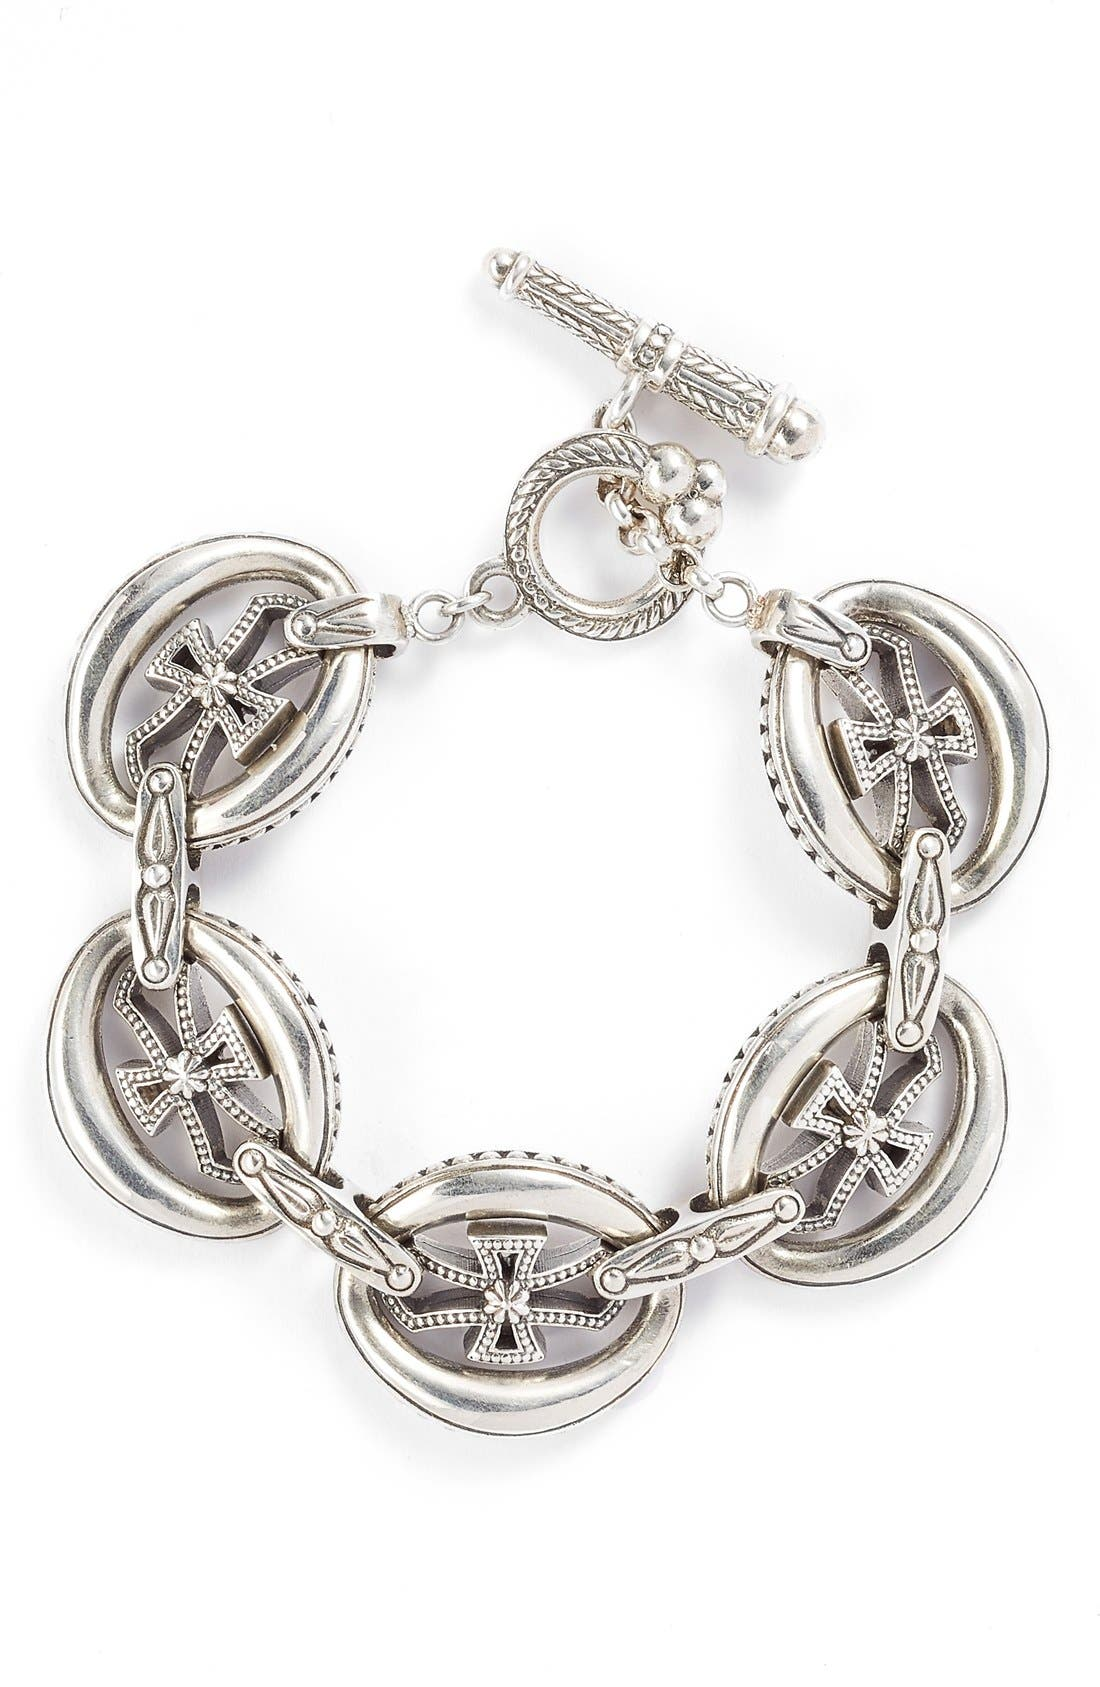 Main Image - Konstantino 'Penelope' Cross Link Bracelet